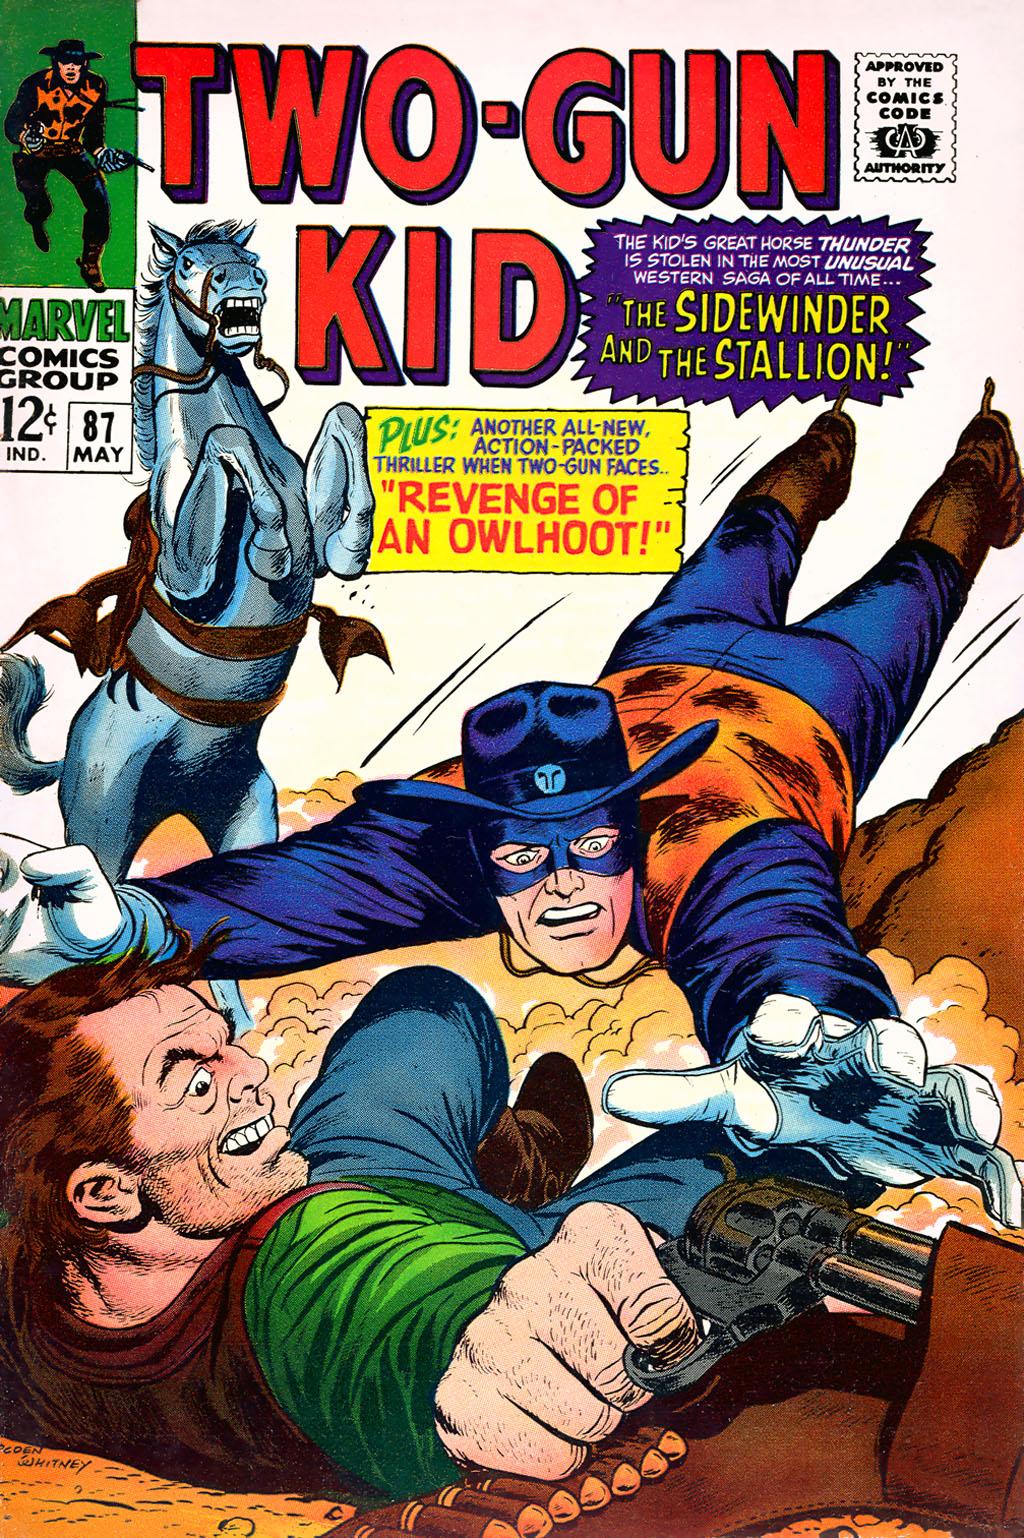 Read online Two-Gun Kid comic -  Issue #87 - 1